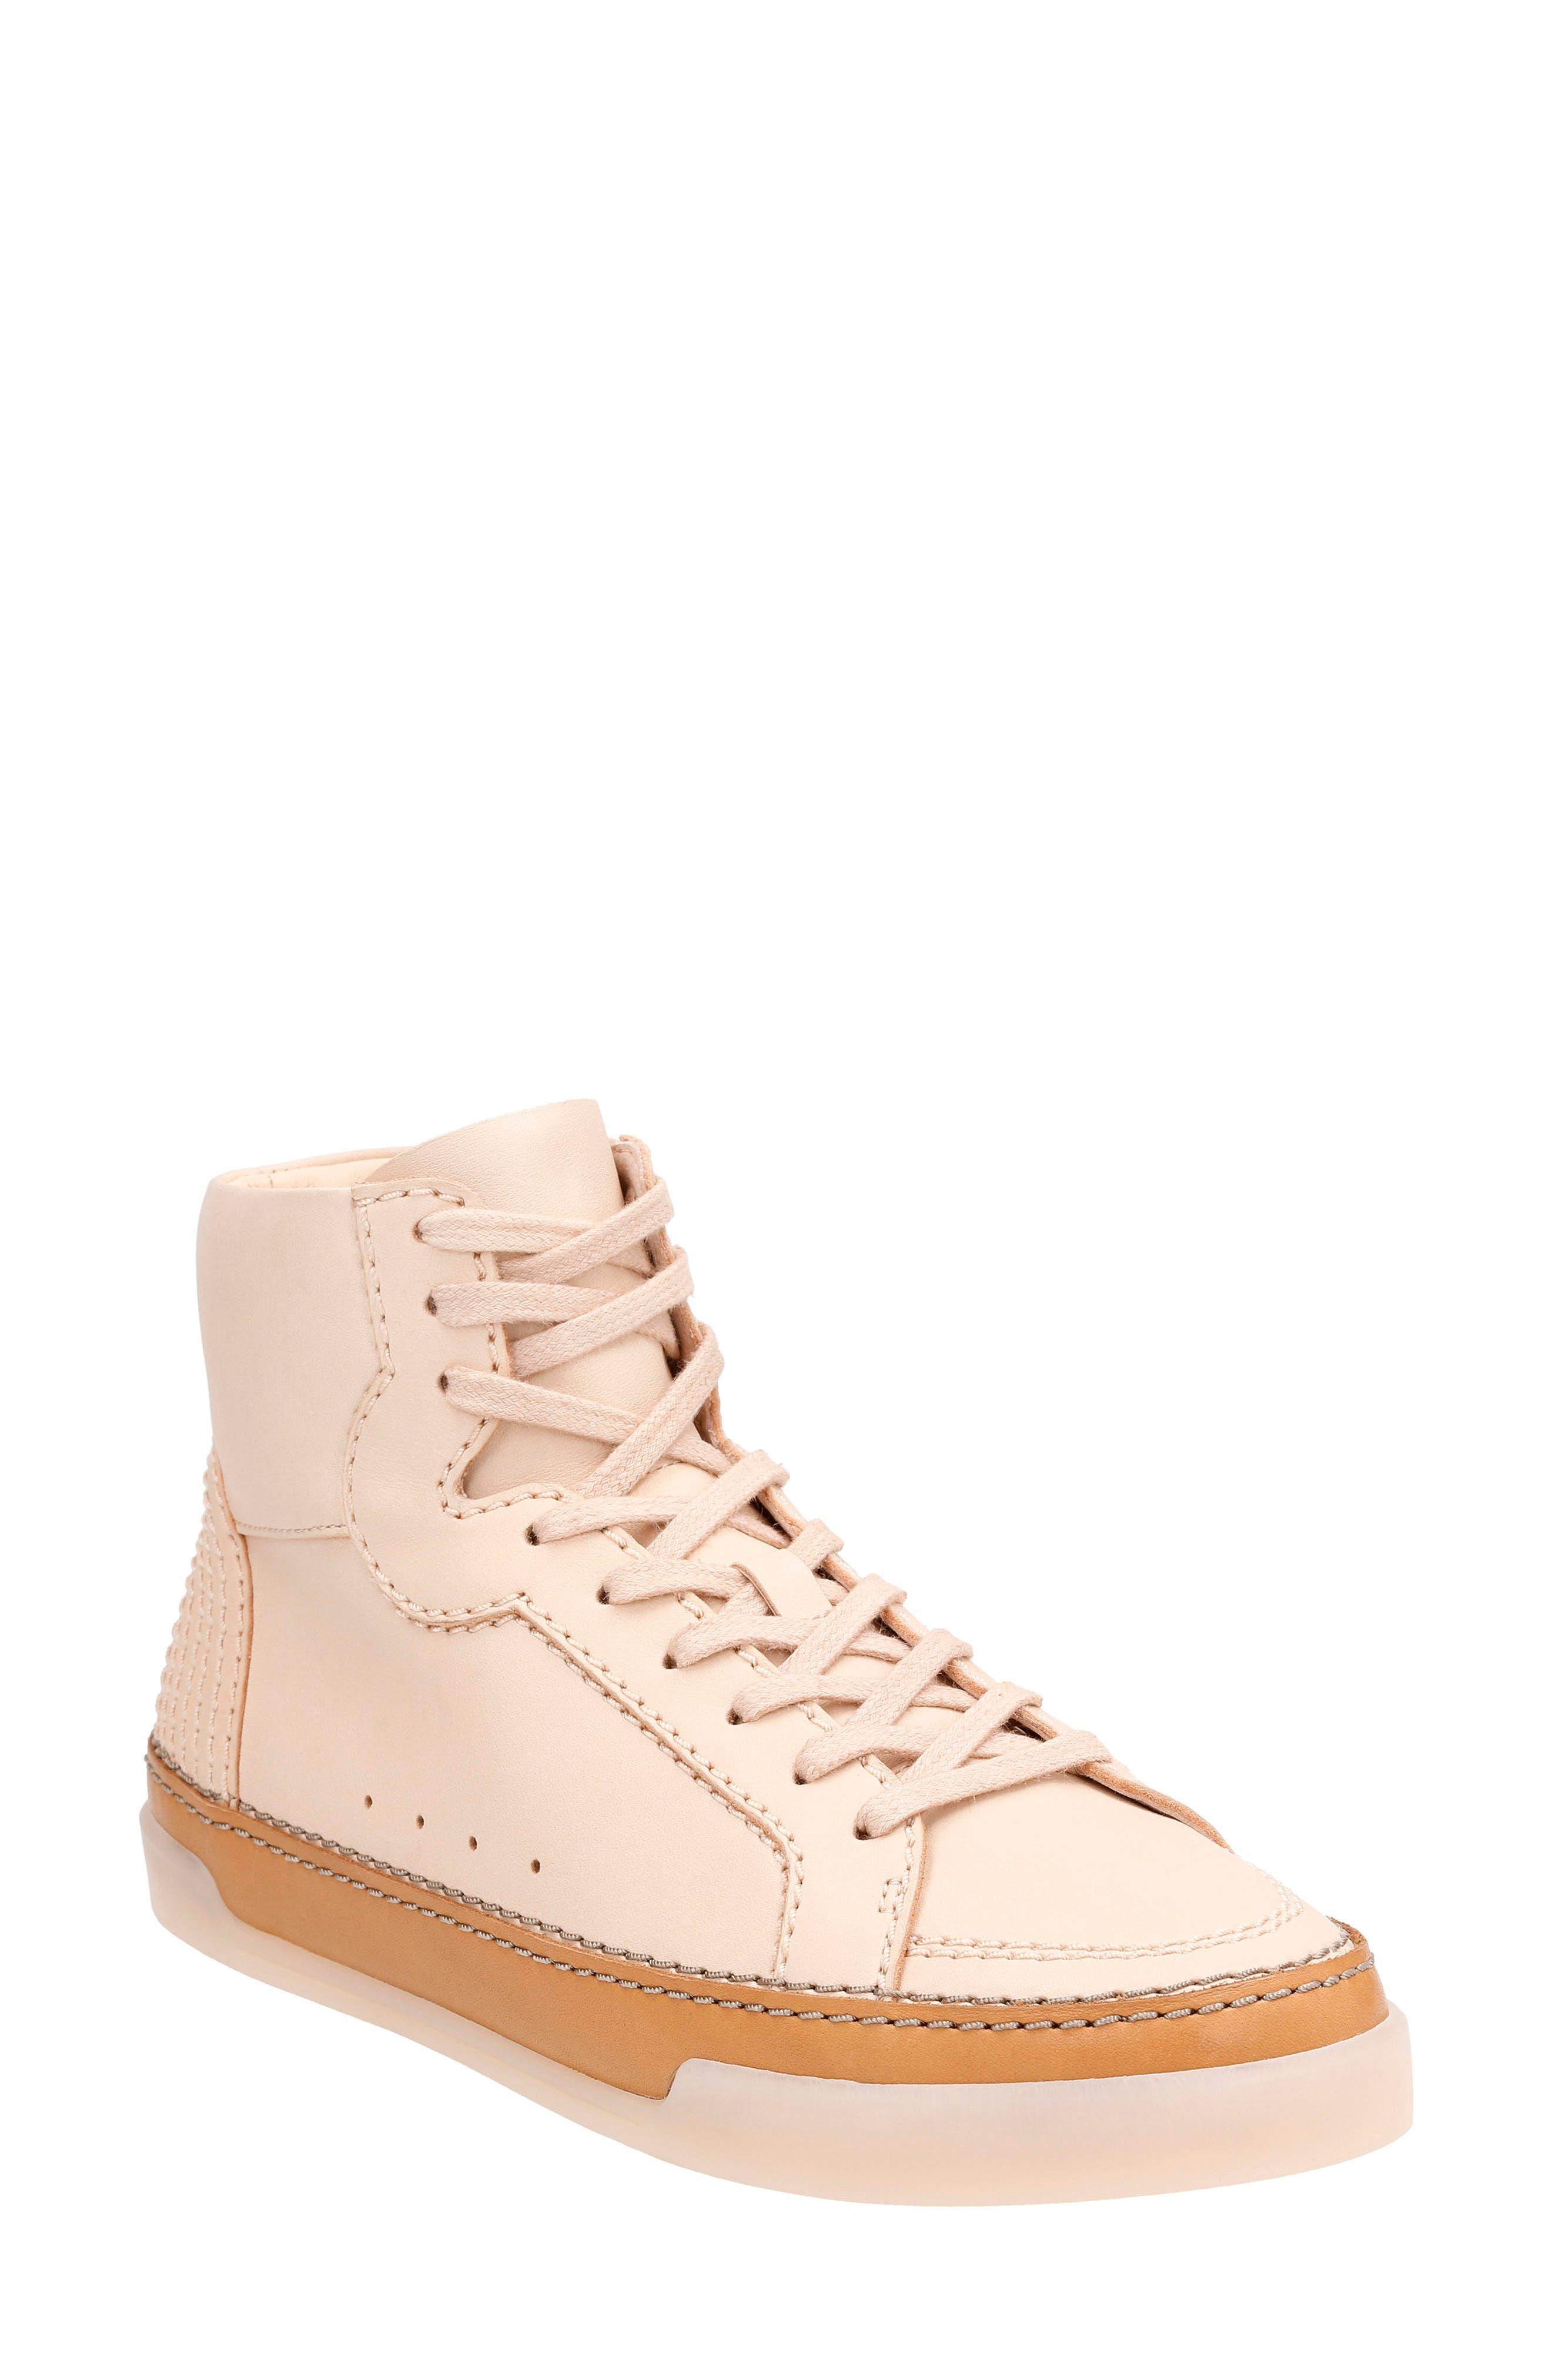 Hidi Haze High Top Sneaker,                             Main thumbnail 2, color,